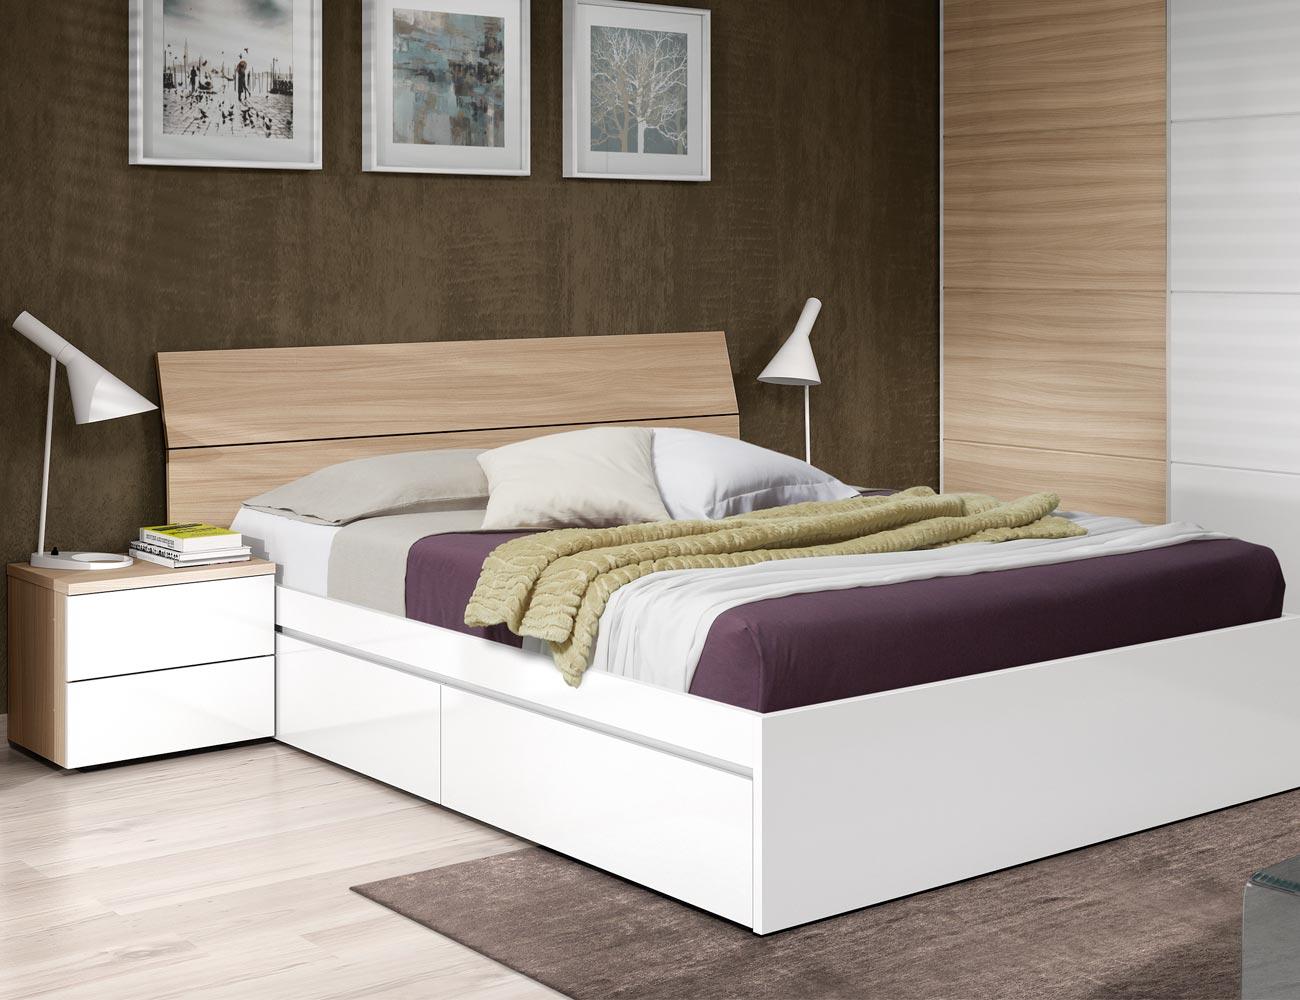 Dormitorio matrimonio luces leds roble 1